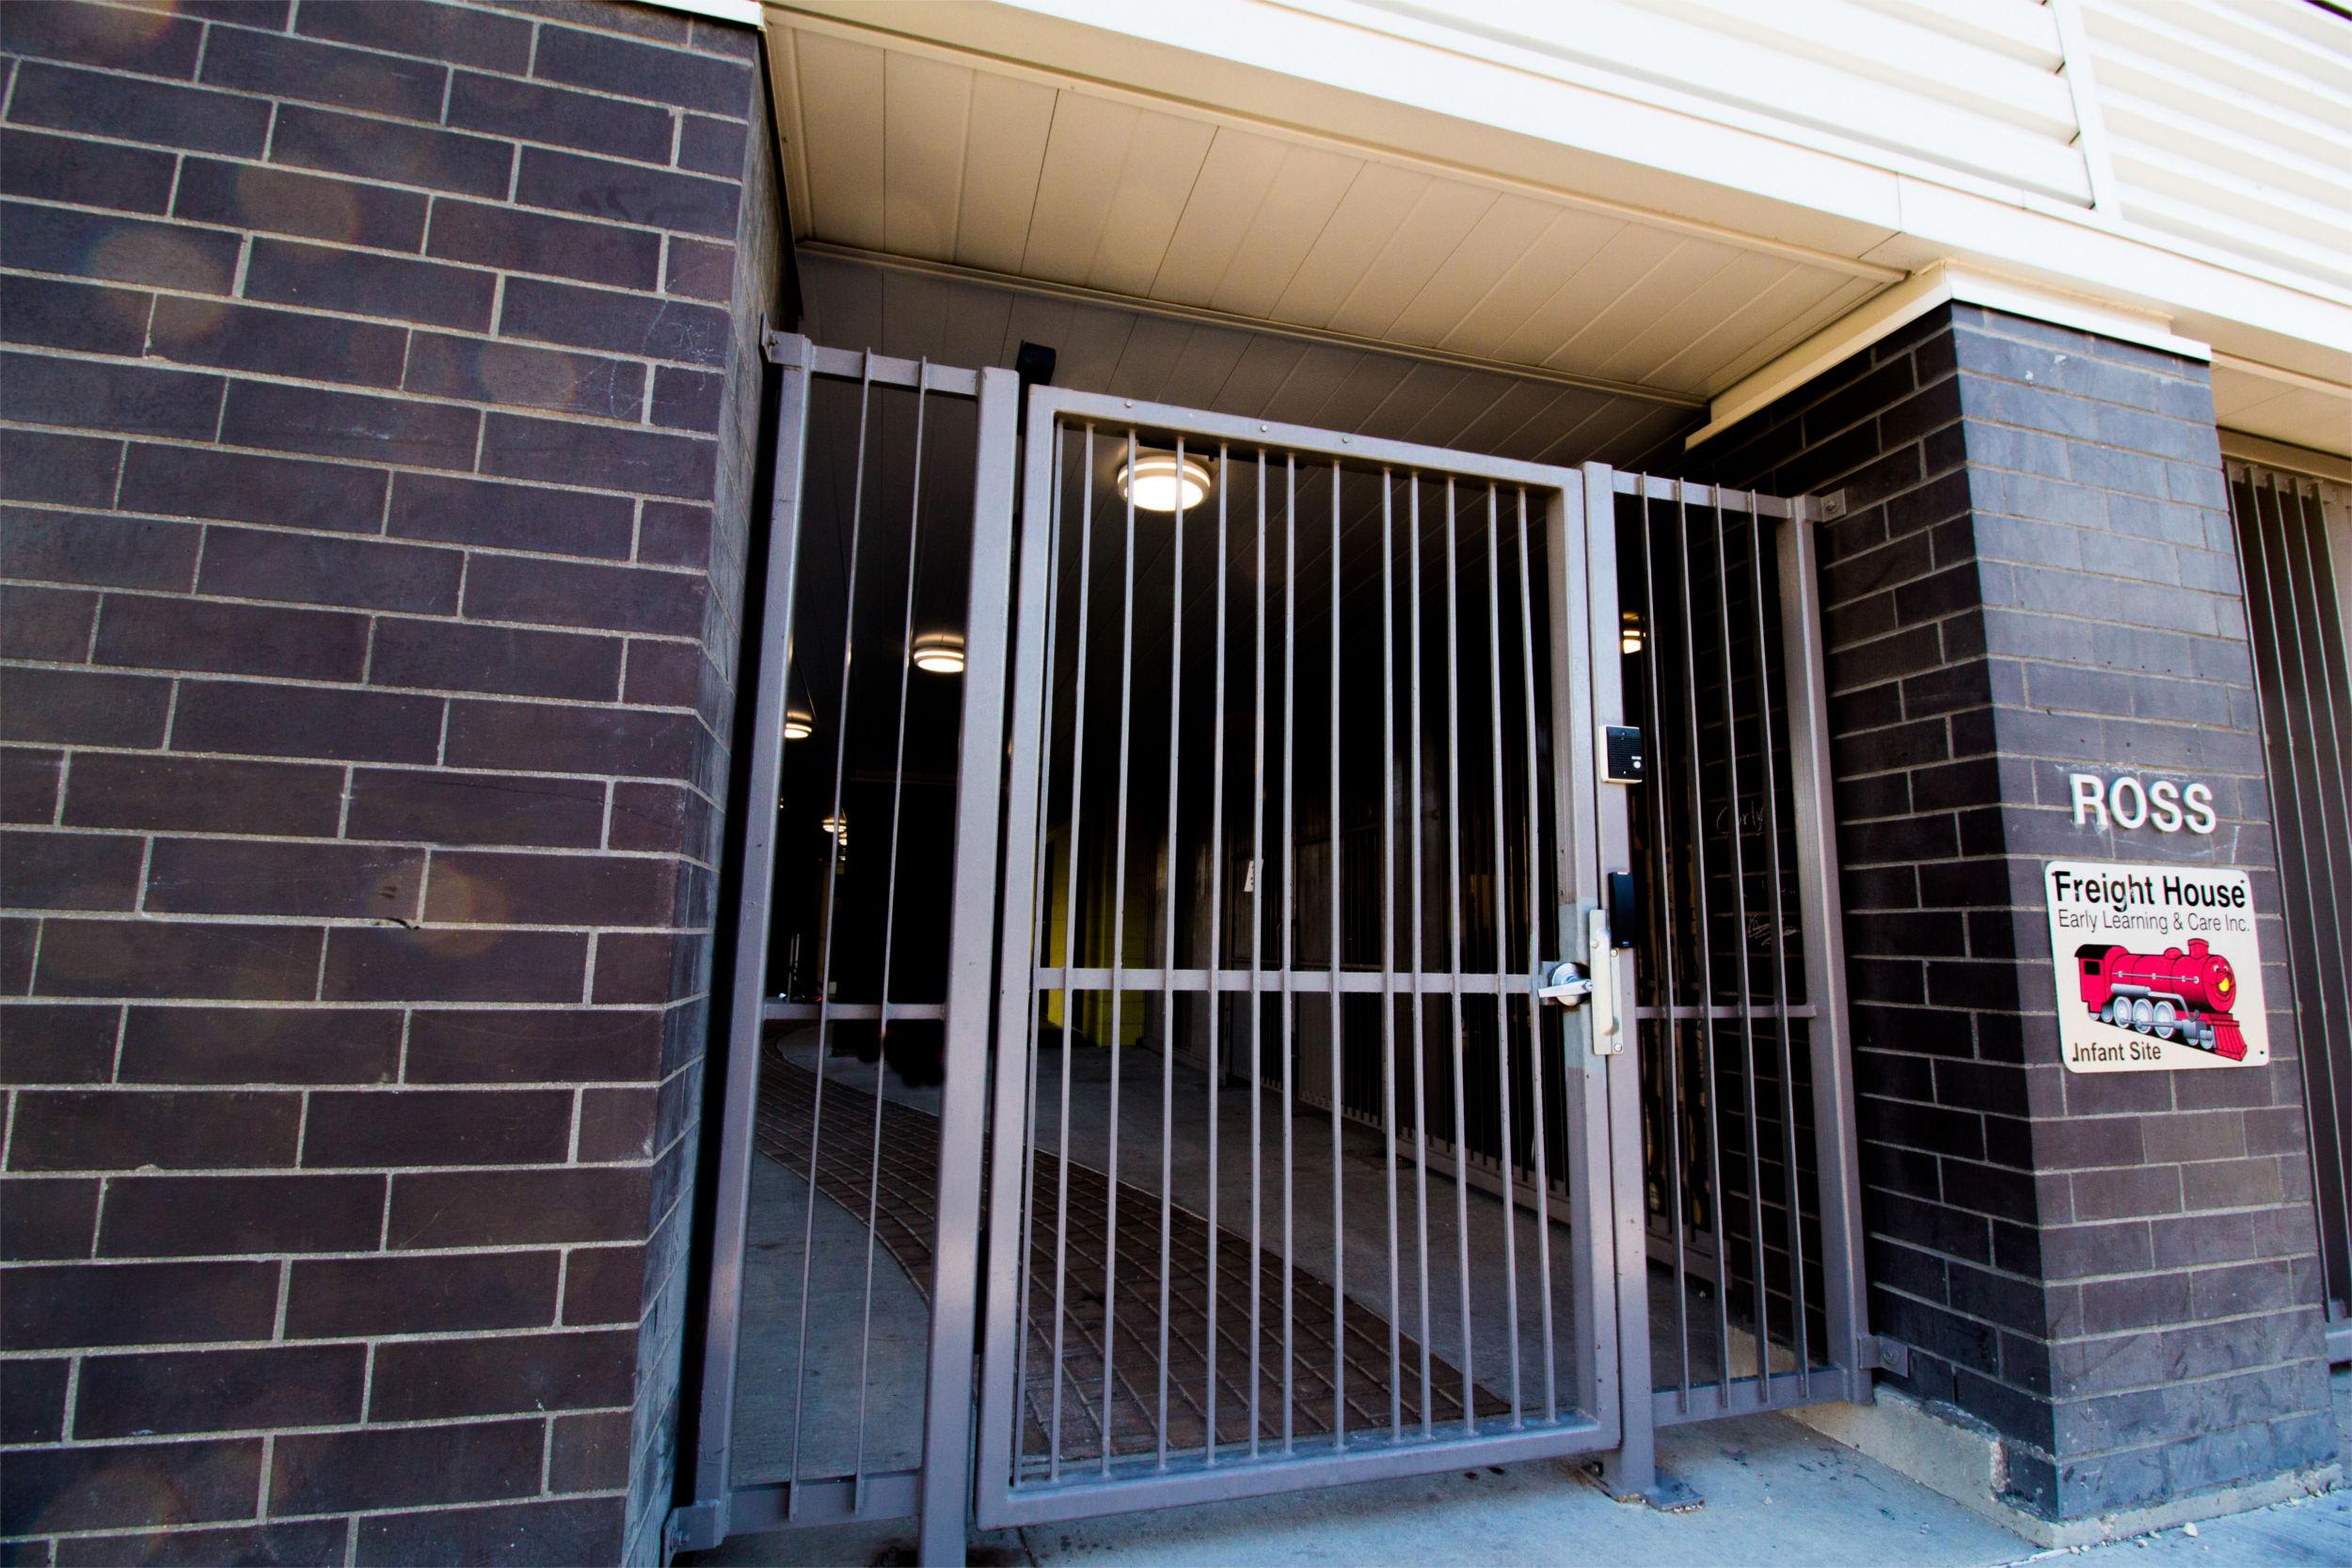 Pedestrian Gate Wallace Perimeter Security